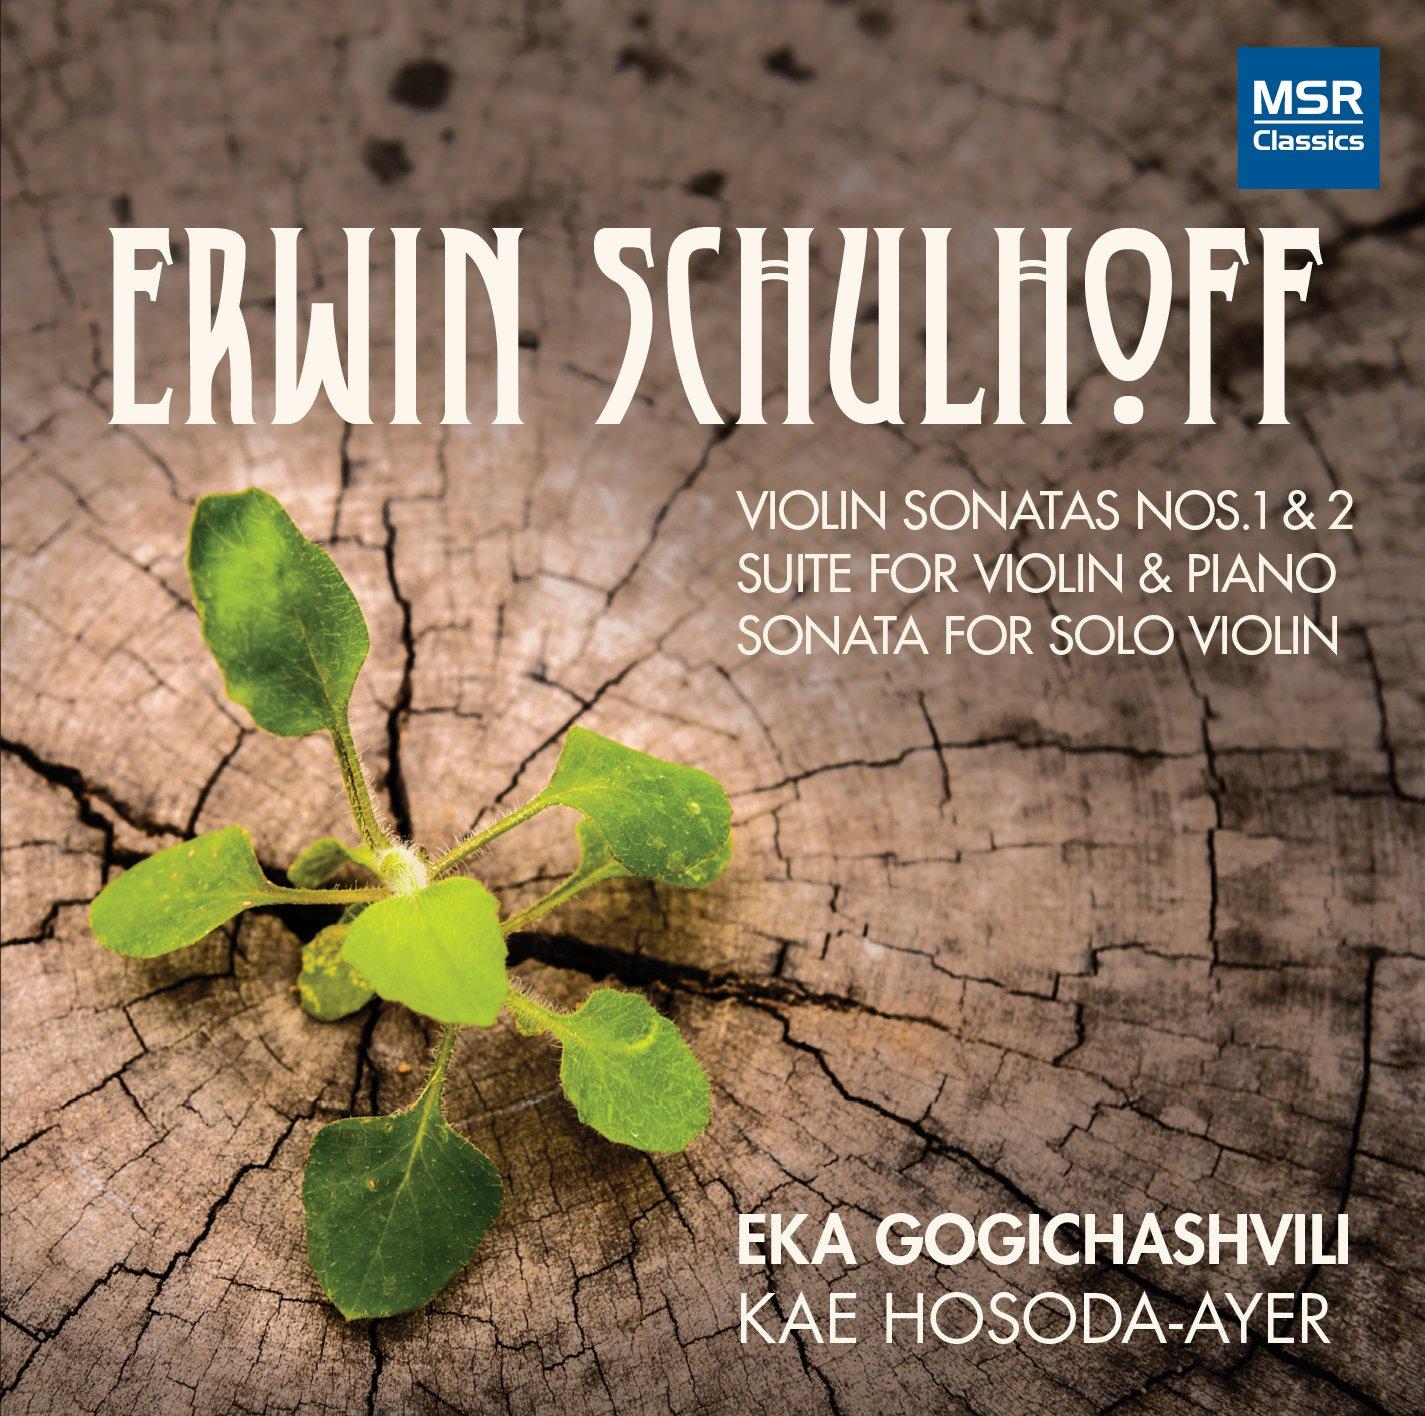 CD : EKA GOGICHASHVILI (VIOLIN) - KAE HOSODA-AYER (PIANO) - Schulhoff: Violin Sonatas Nos. 1 & 2 (CD)